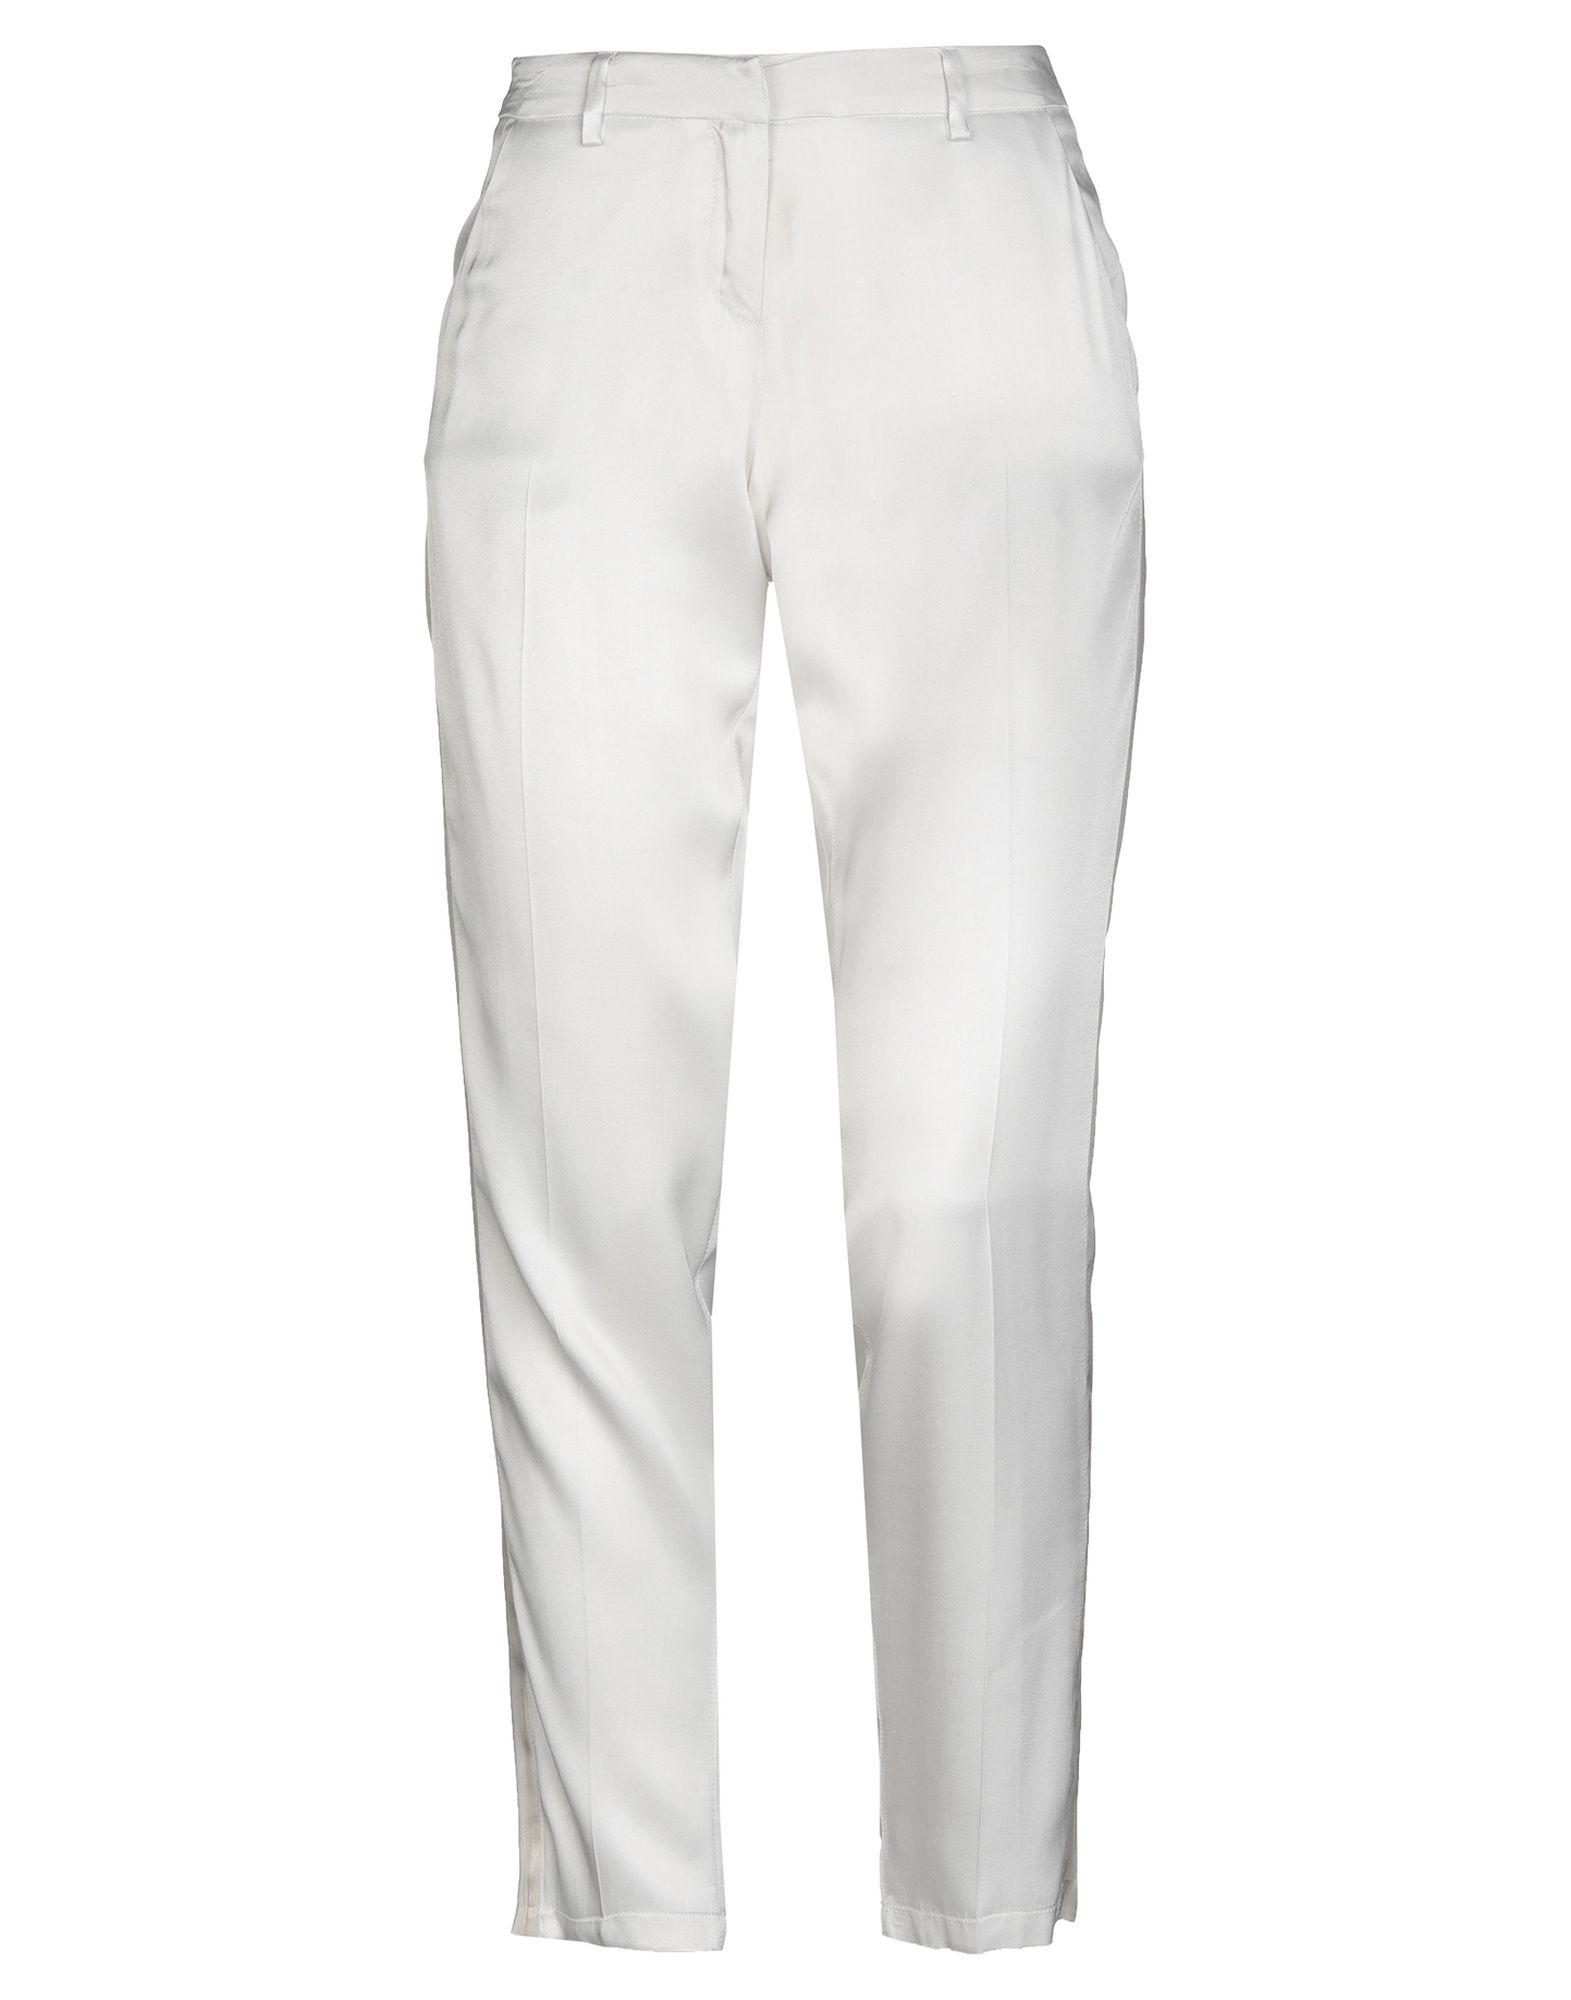 Pantalone Coast Weber & Ahaus damen - 13296837SU